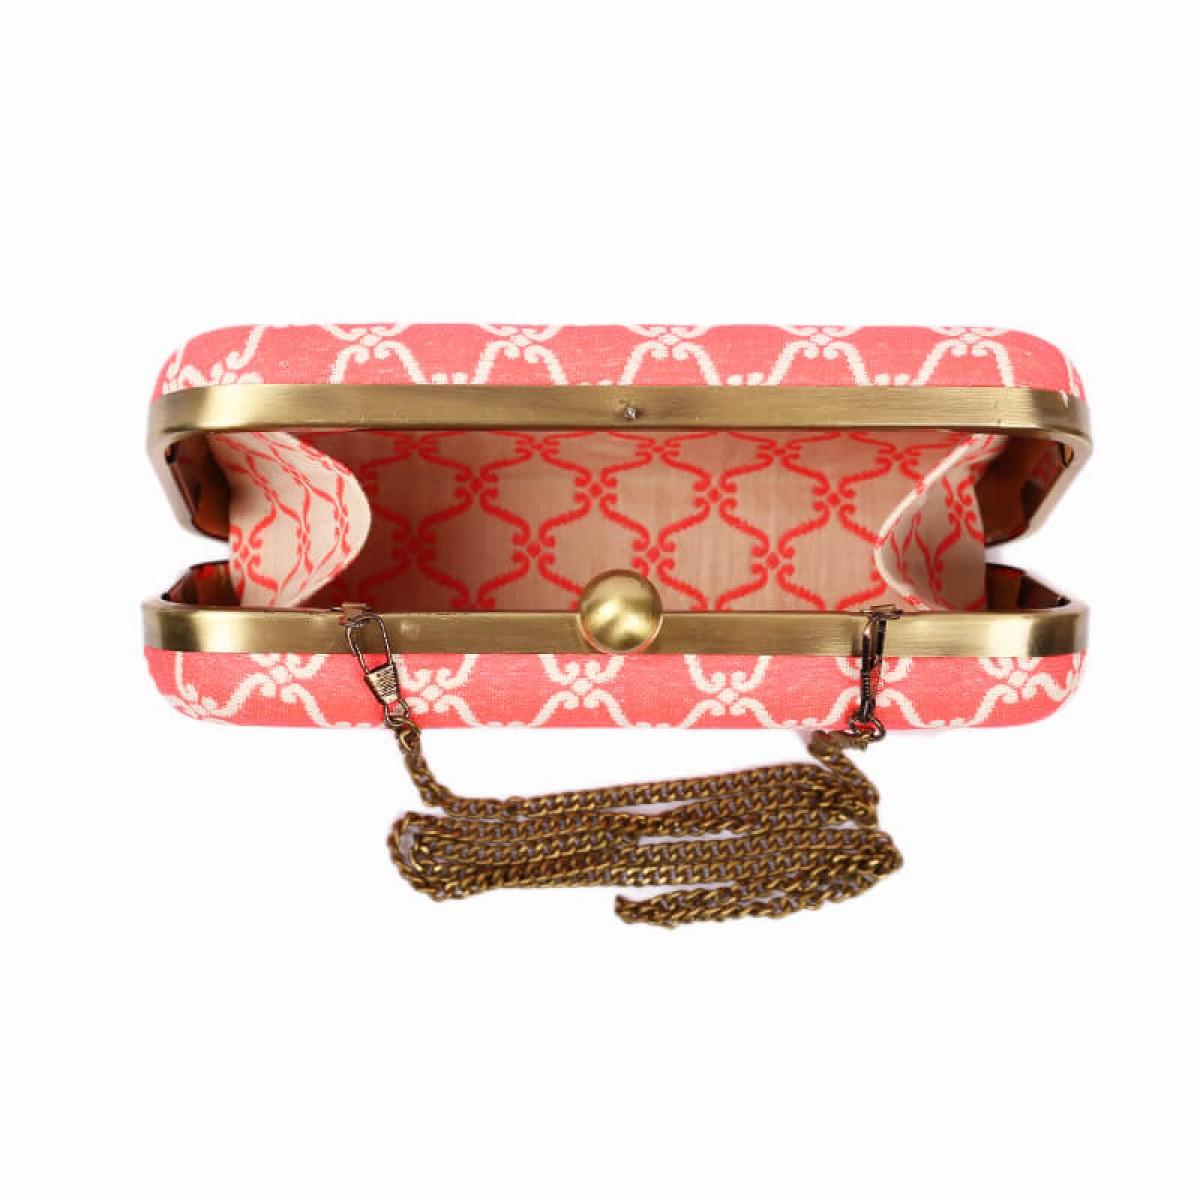 Evening Pattern Clutch Bag - Pink